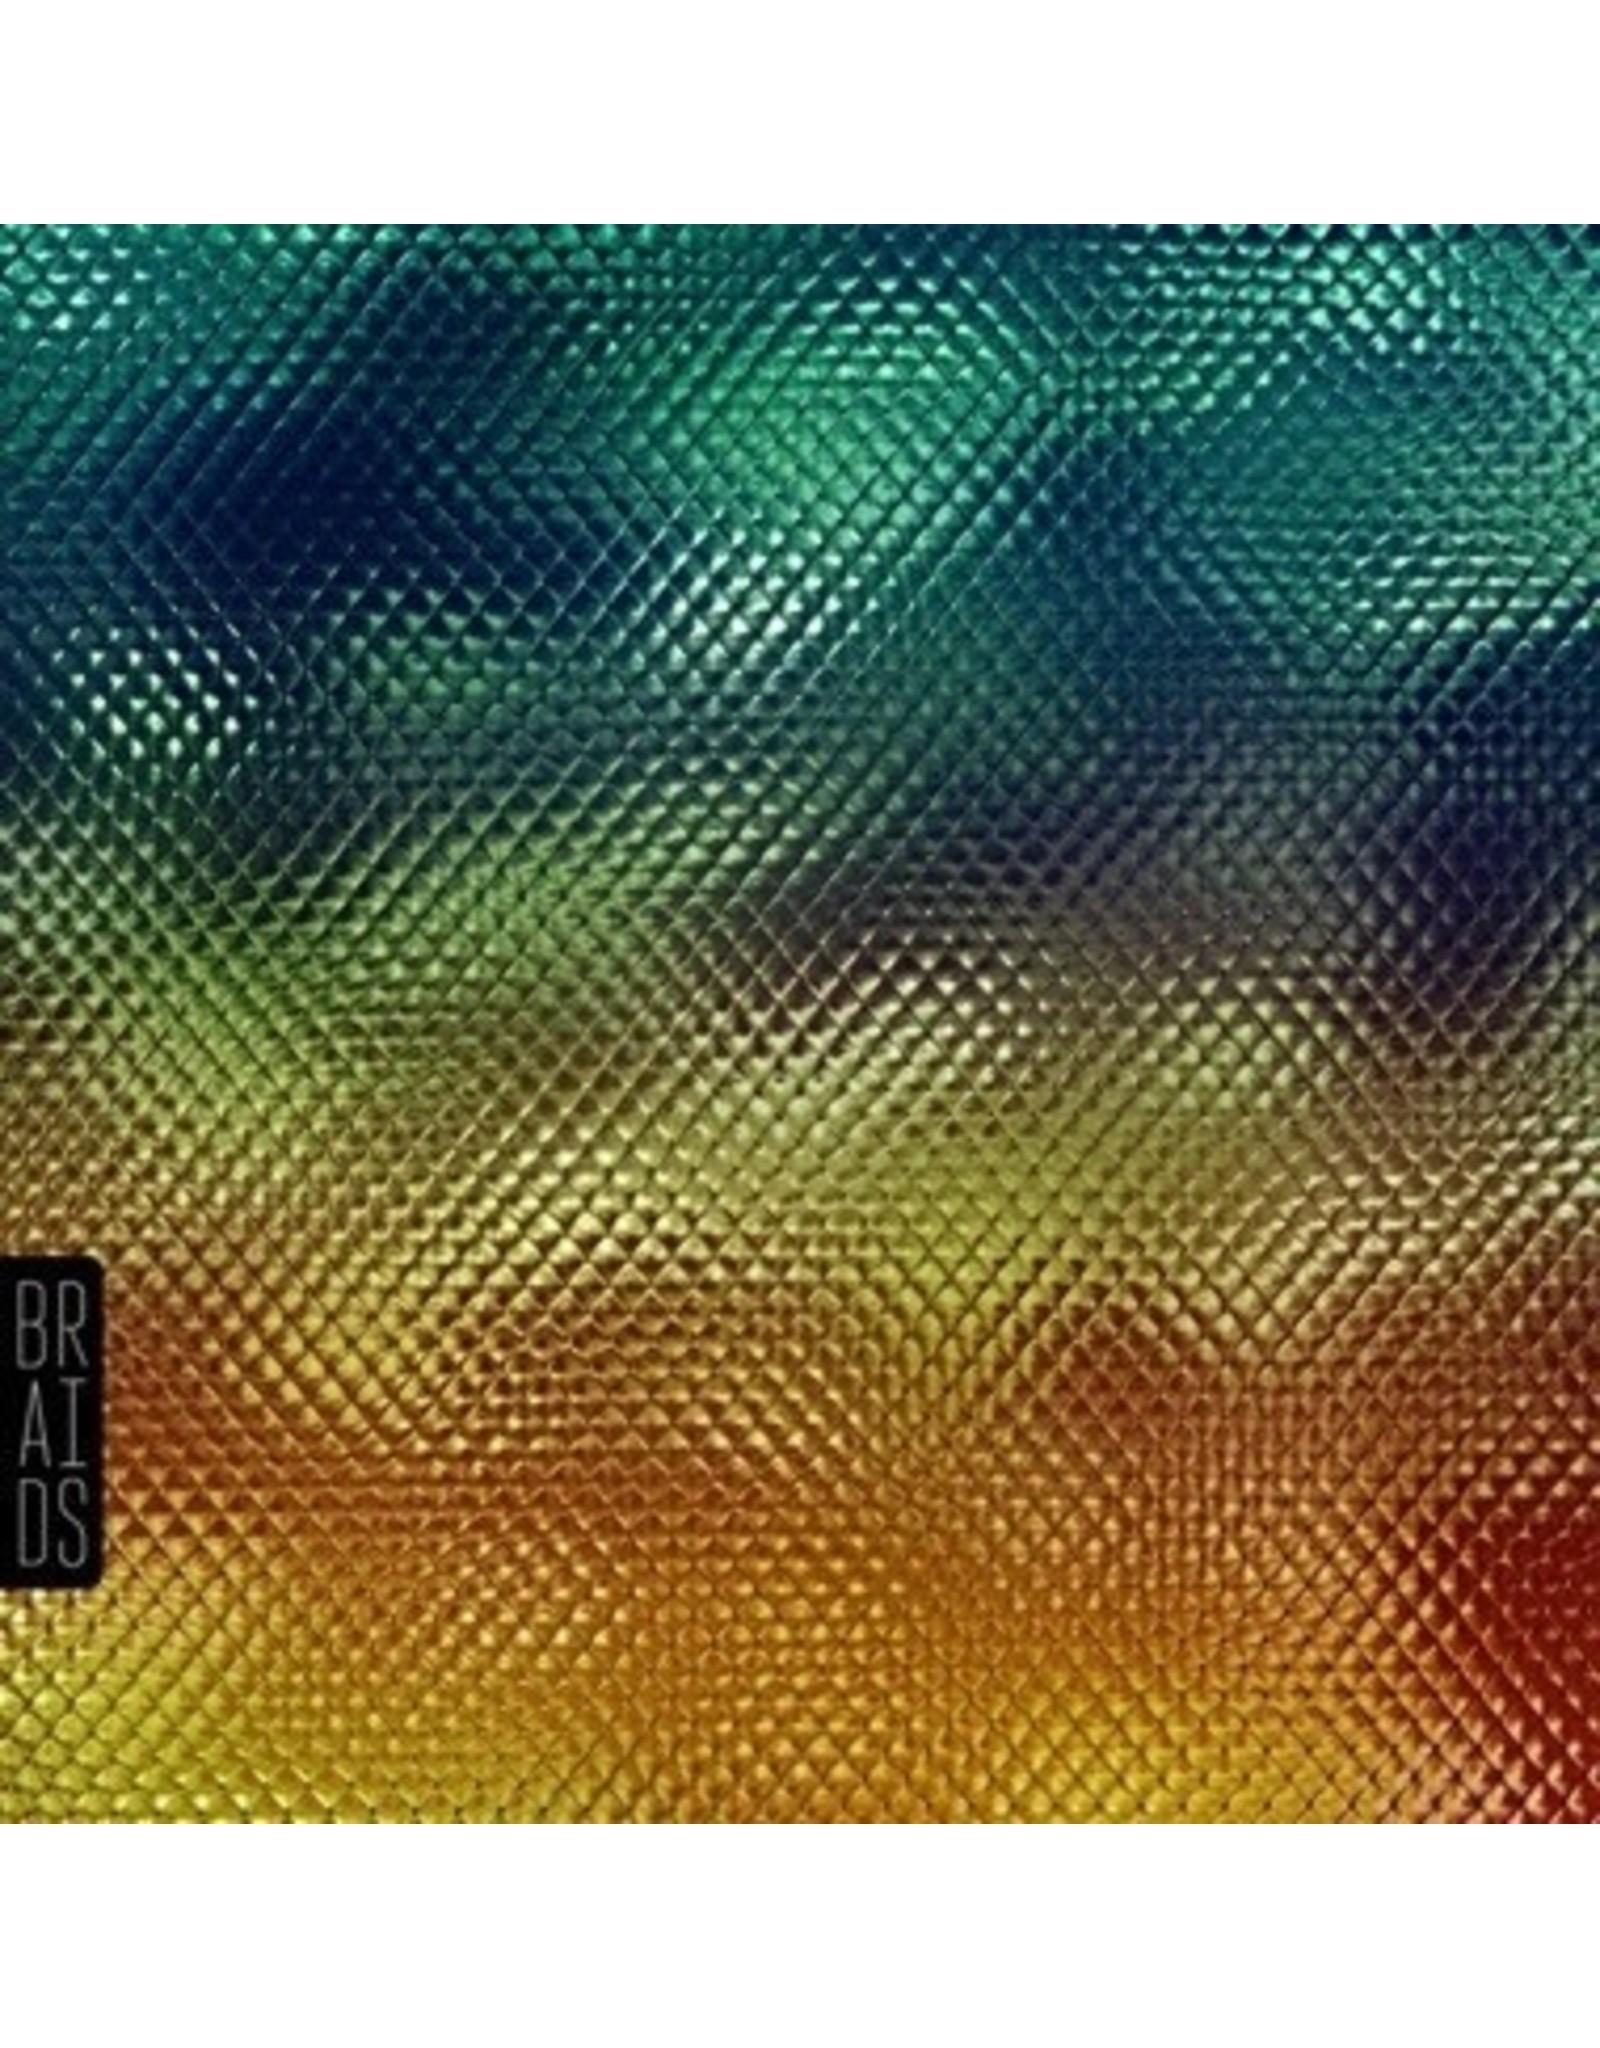 New Vinyl BRAIDS - Native Speaker (10th Anniversary, Green & Clear) LP